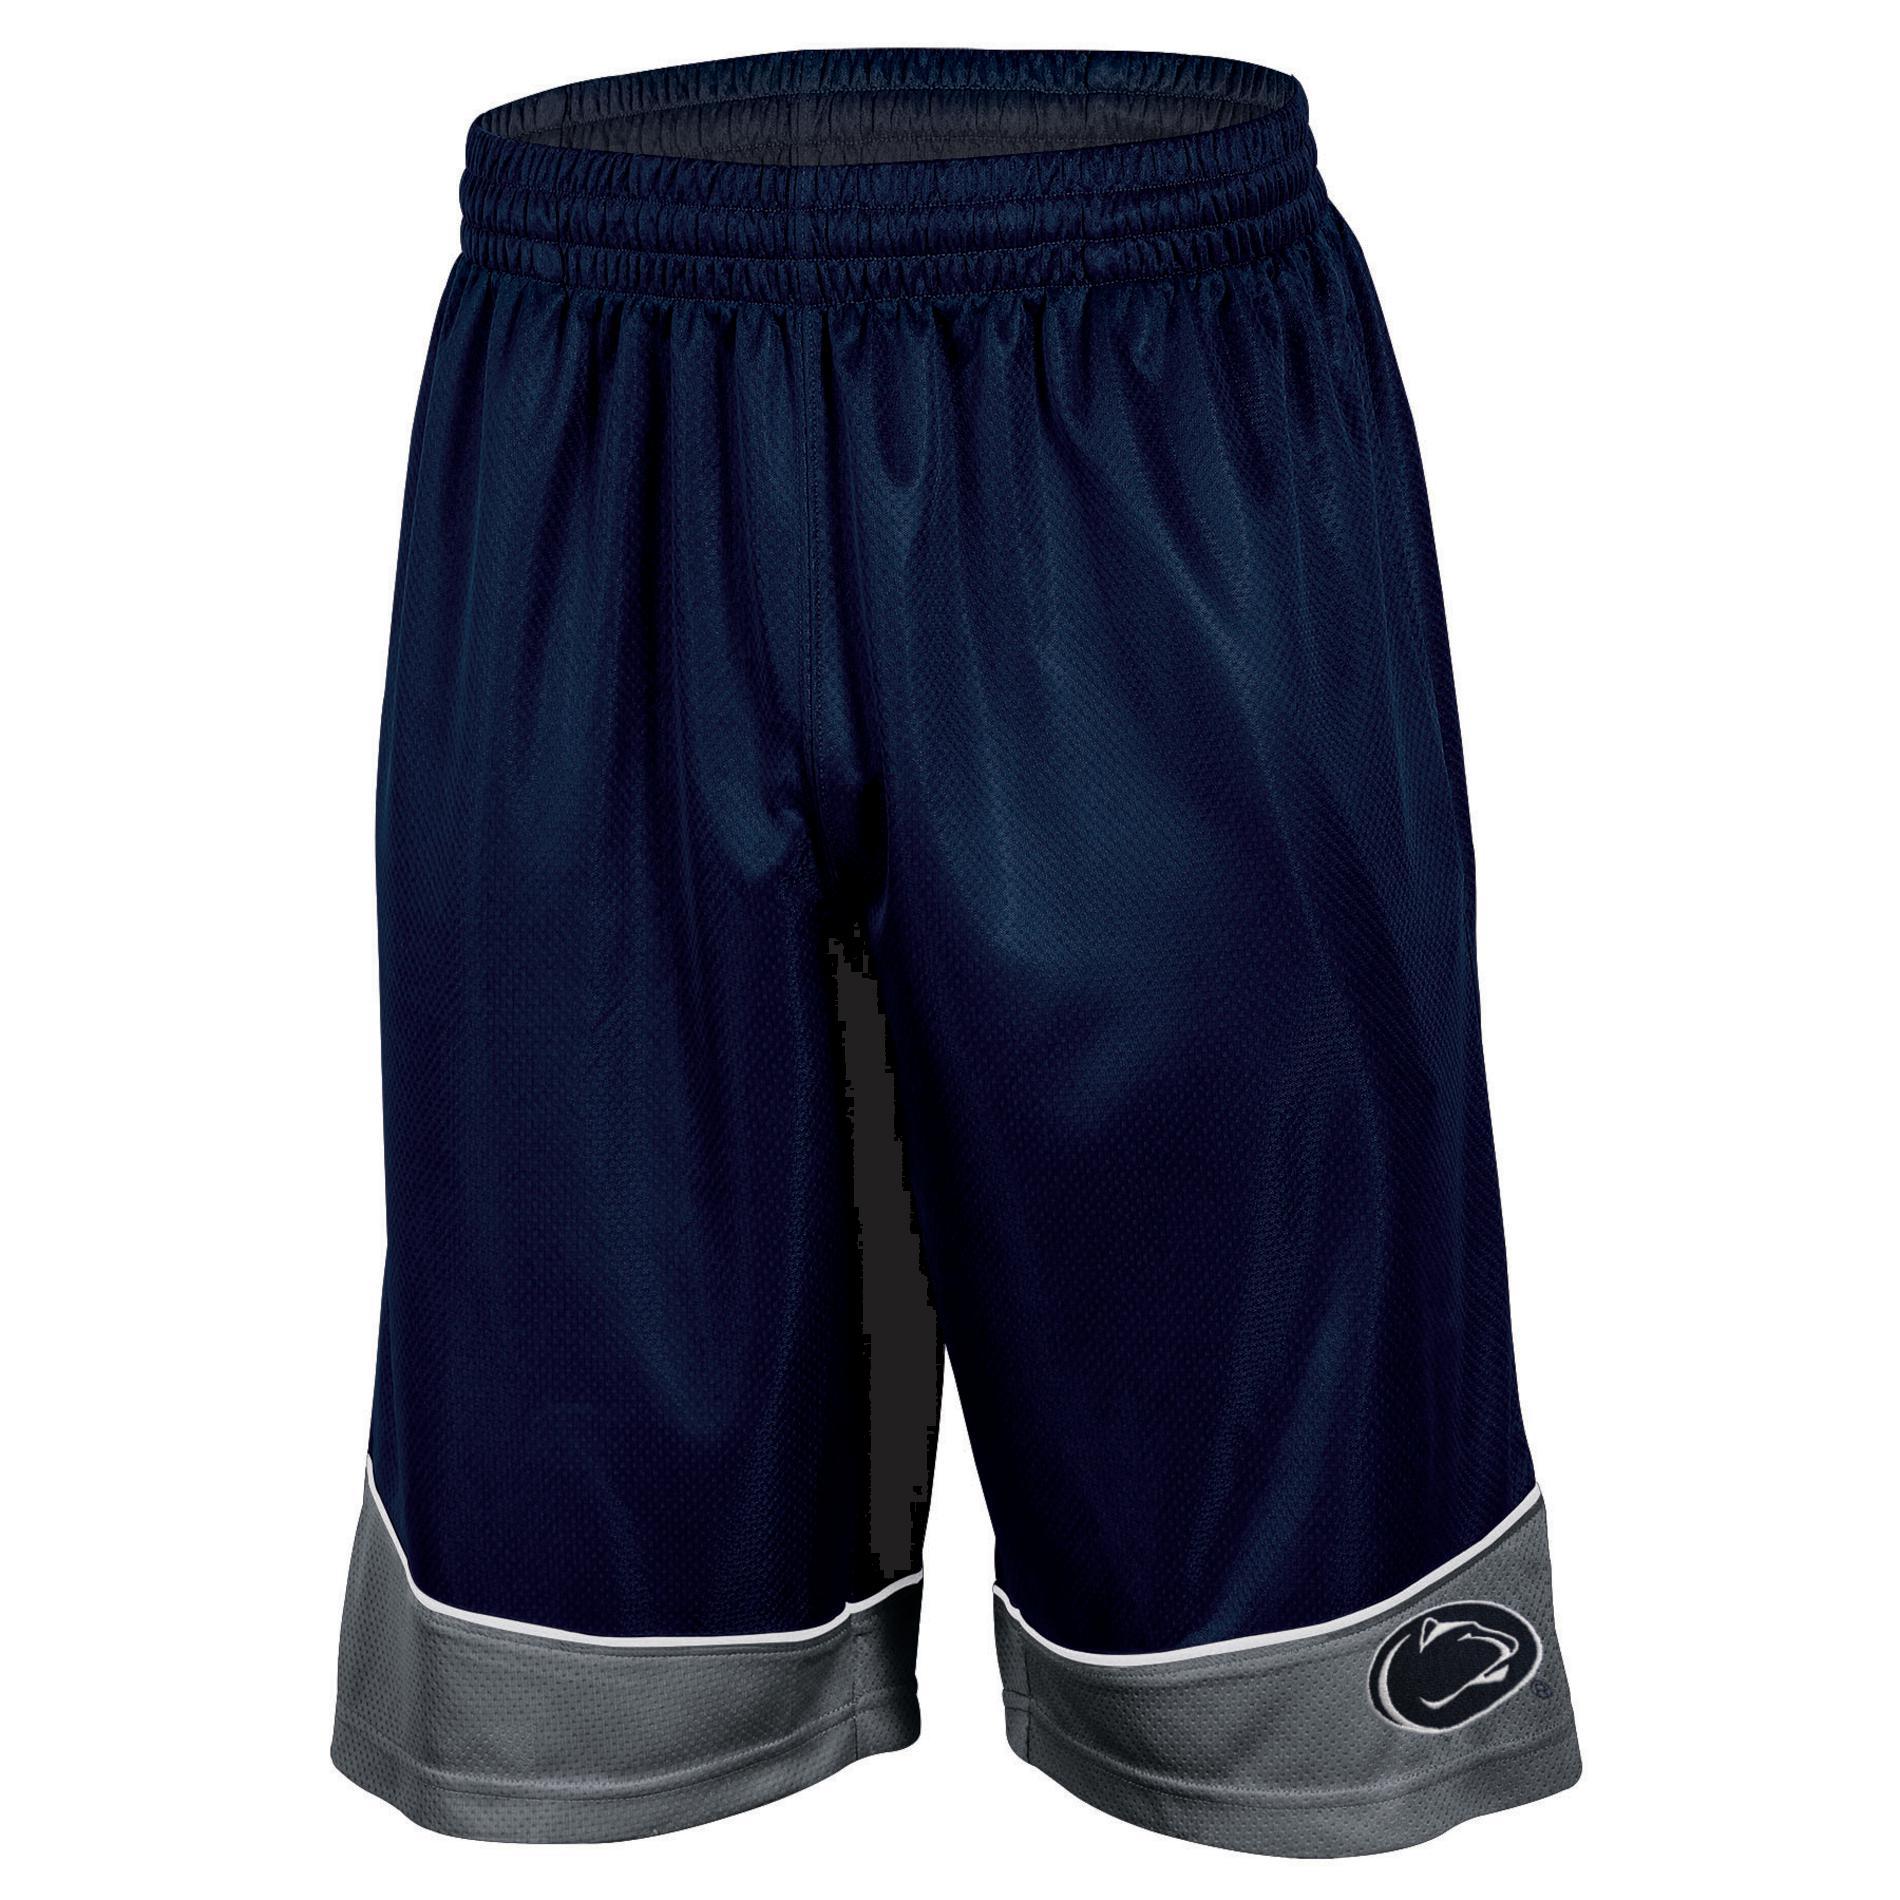 NCAA Men's Basketball Shorts - Penn State Nittany Lions PartNumber: 046VA94744512P MfgPartNumber: 7AMQJ43KMF